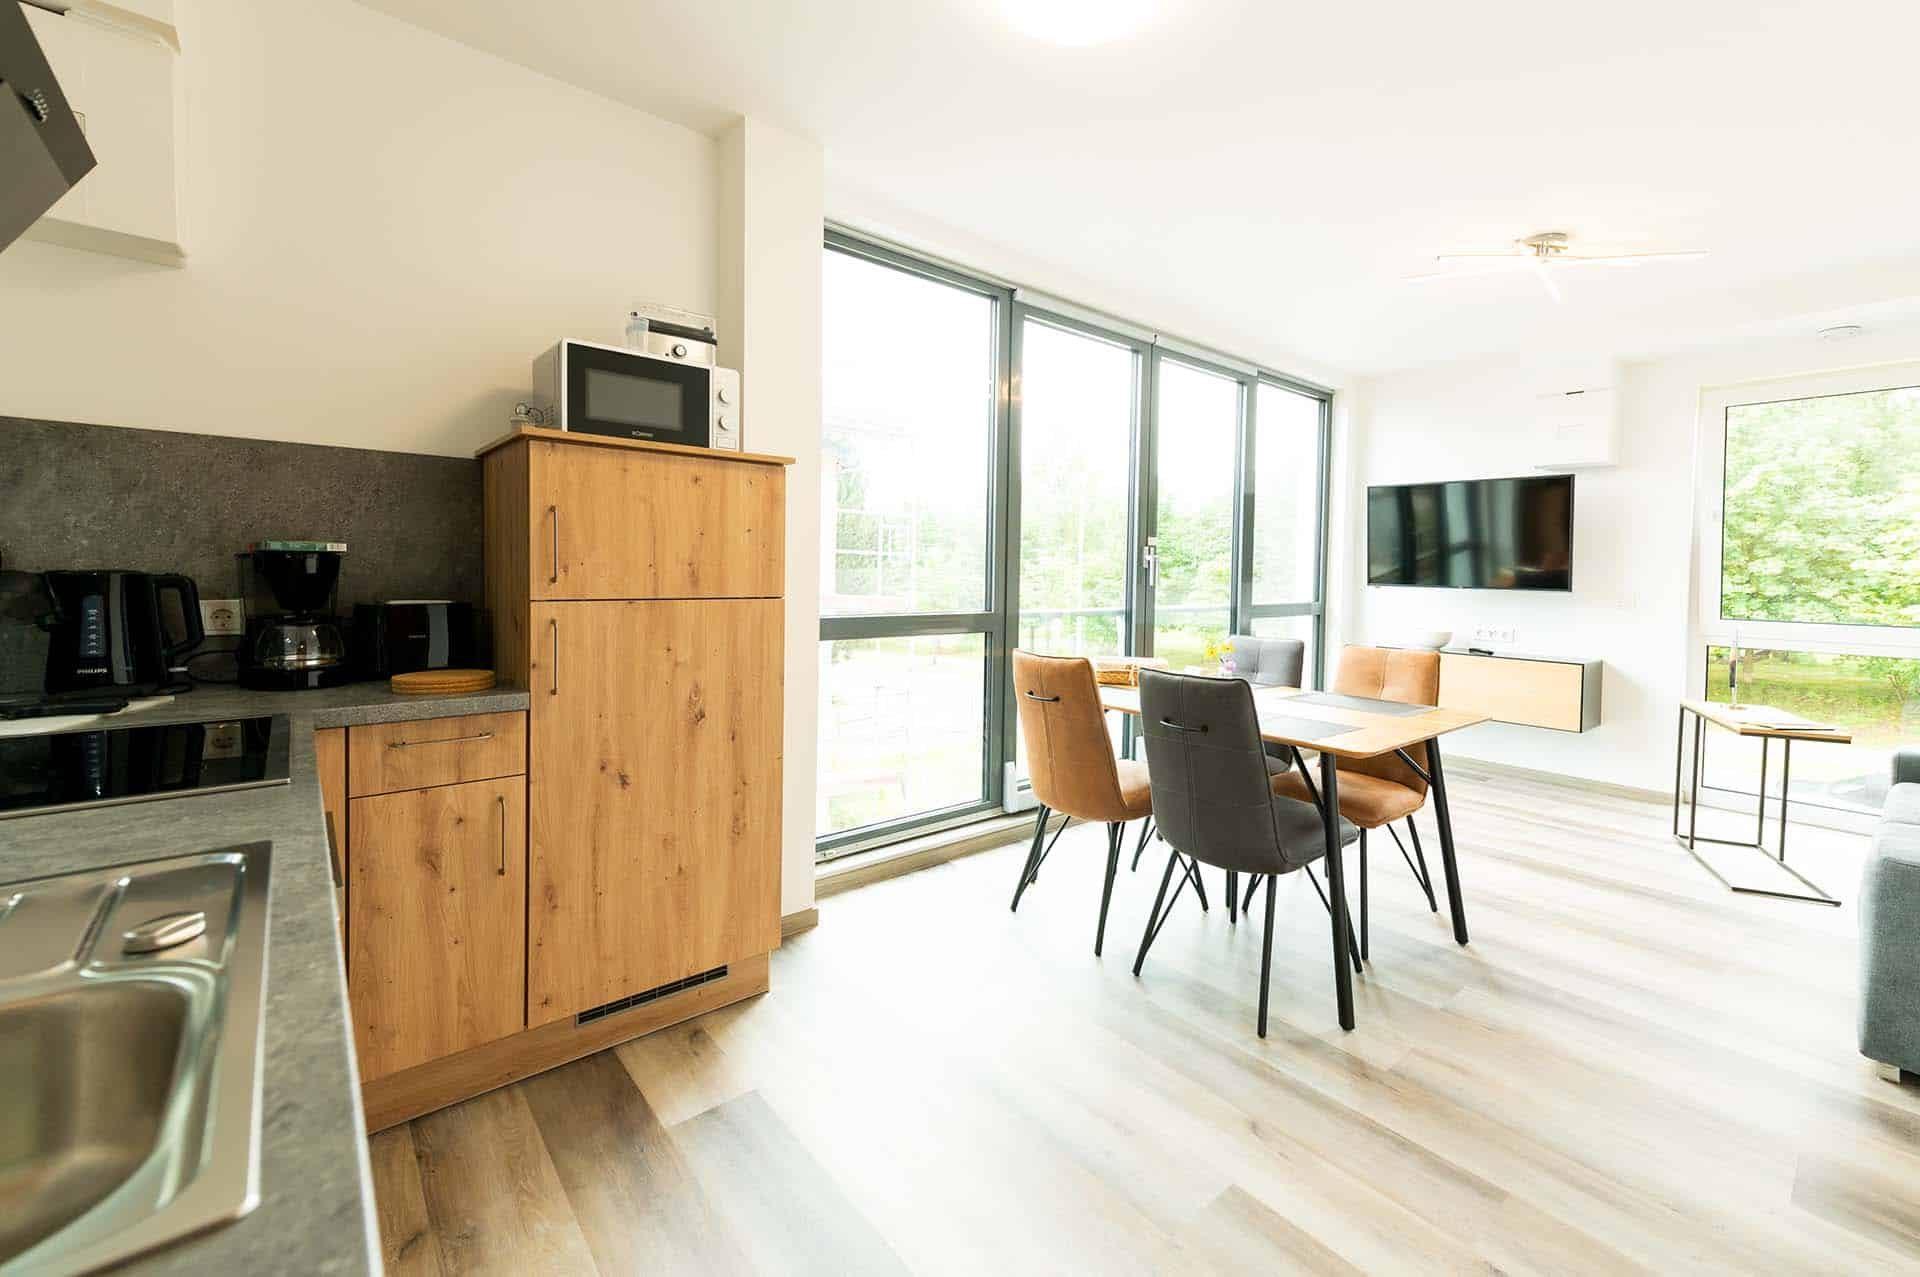 appartement-völklinger-hütte-kueche-essbereich-panorama